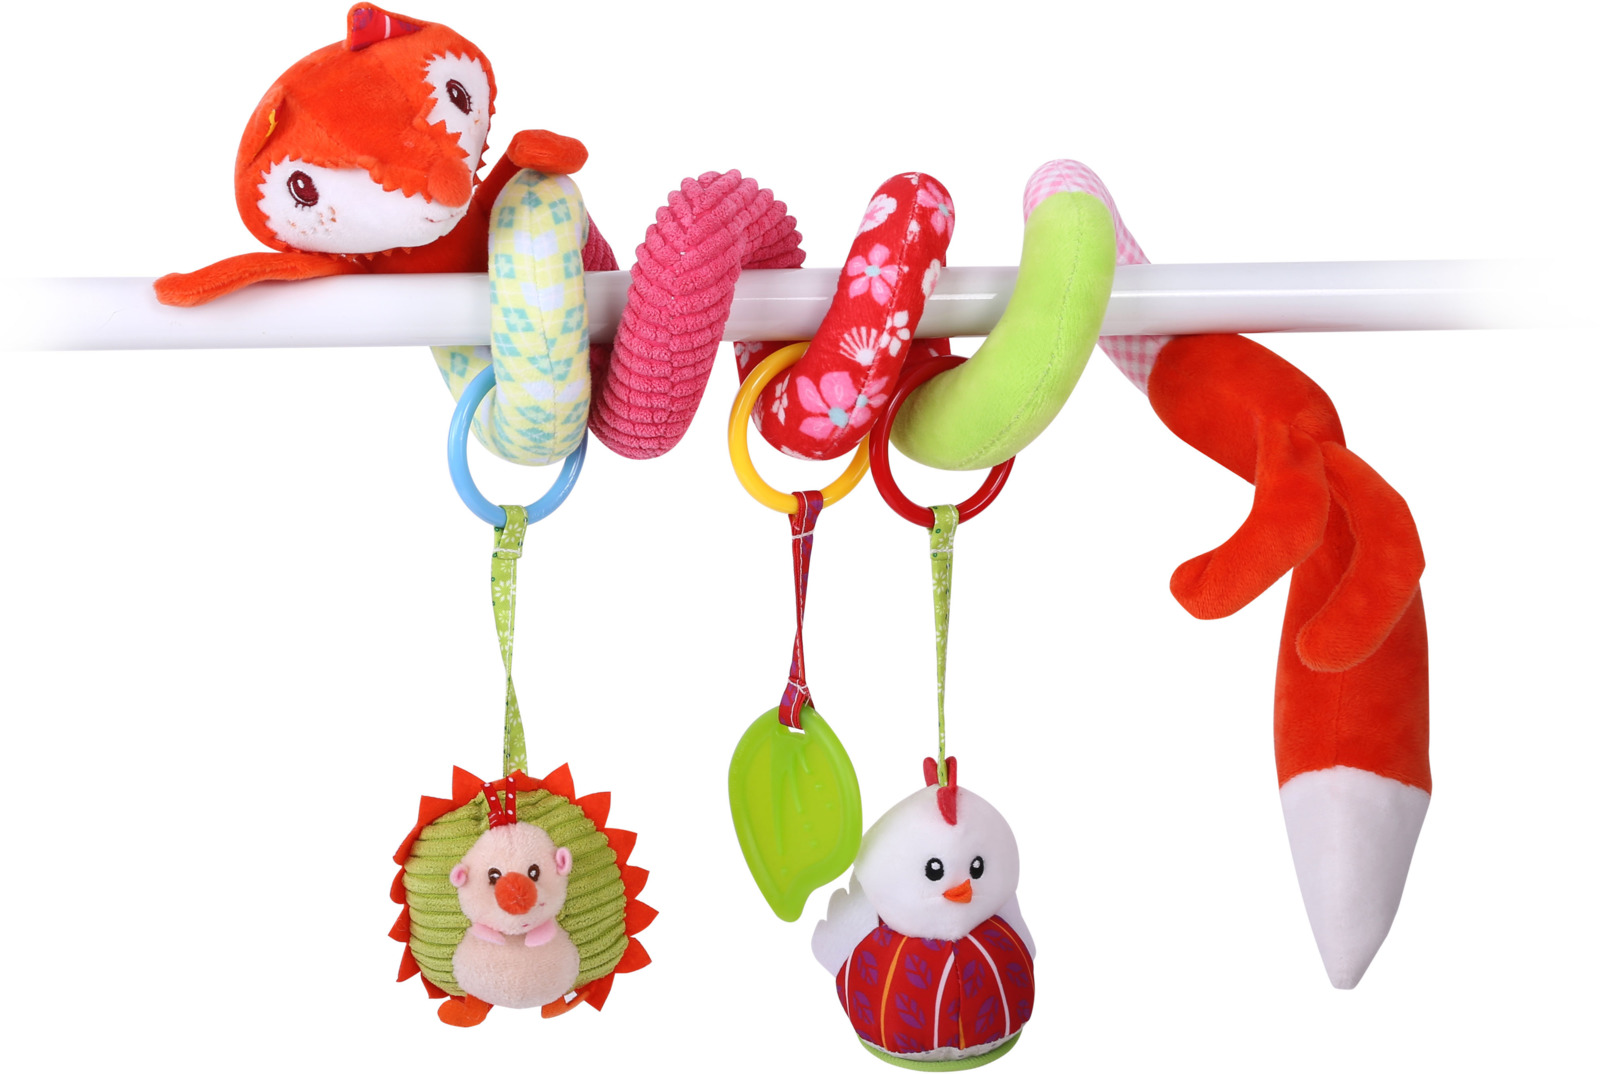 Развивающая игрушка спираль Lorelli Toys Лисичка. 1019122 развивающая игрушка lorelli toys слоник 1019117